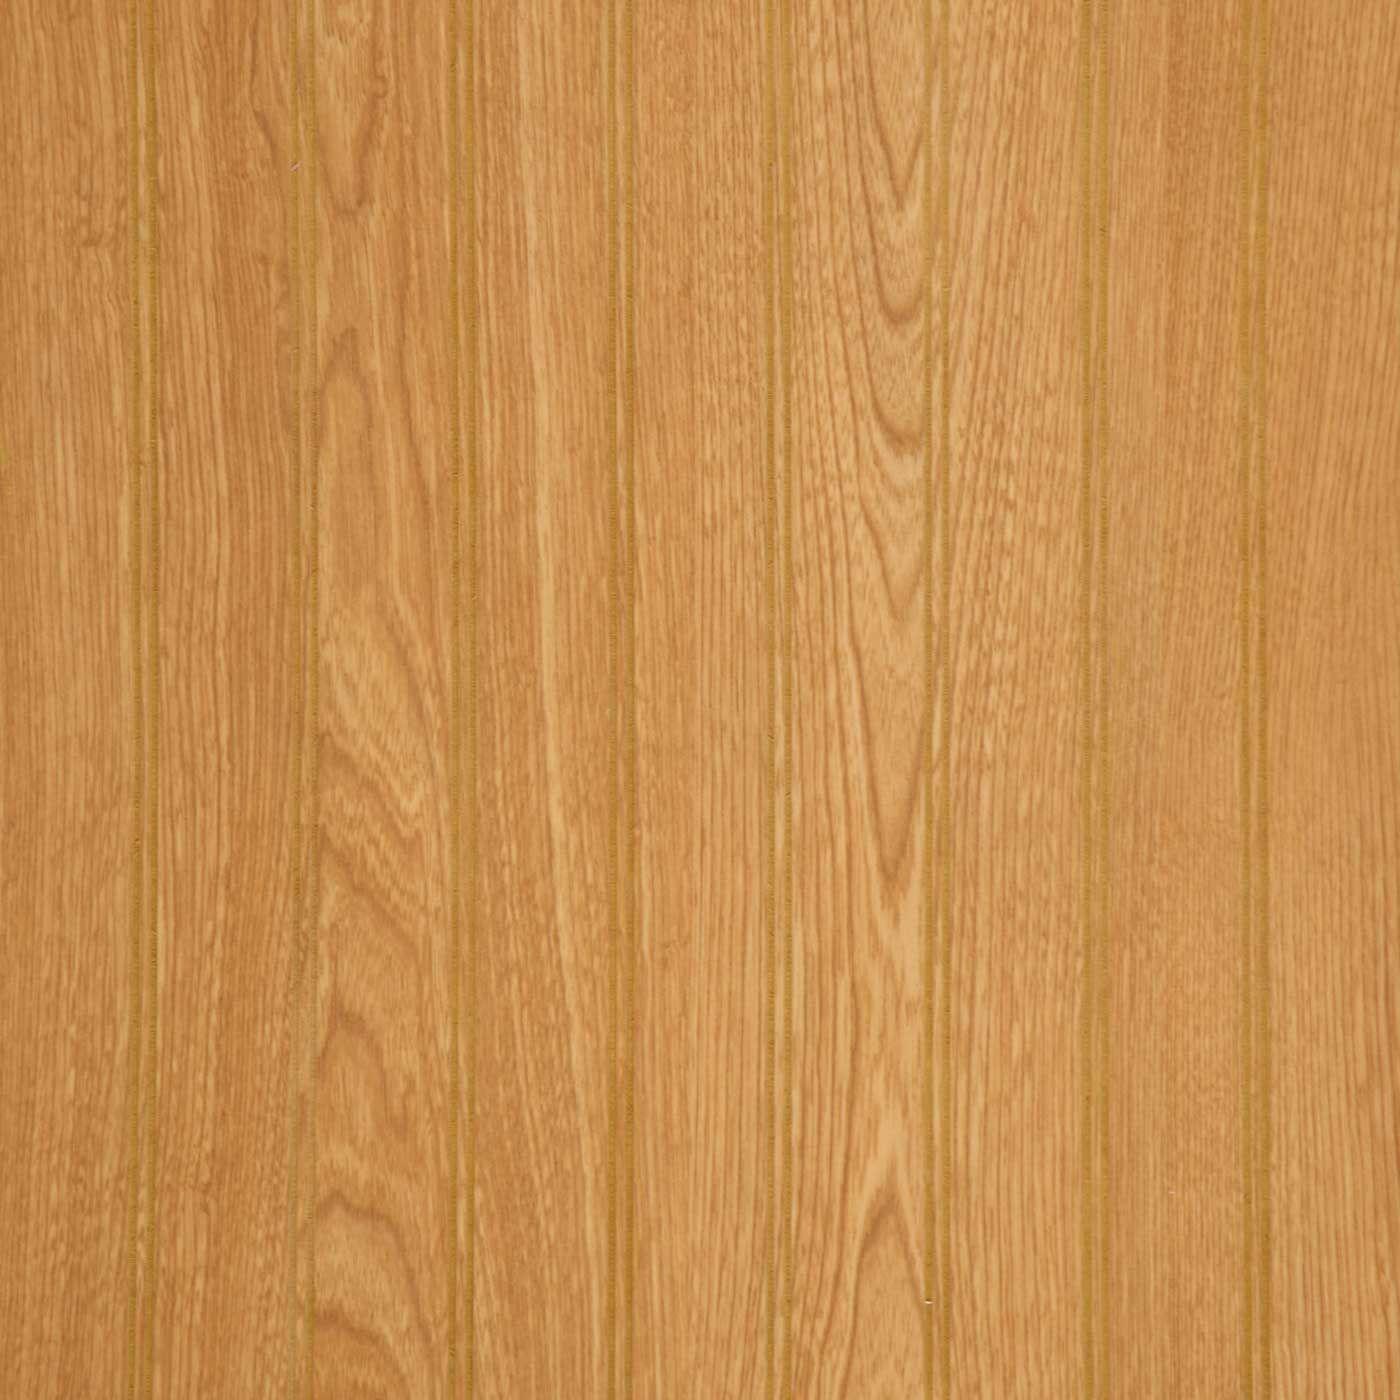 Empire Oak Beaded Panels 4 x 8   Empire, Plywood walls and ...